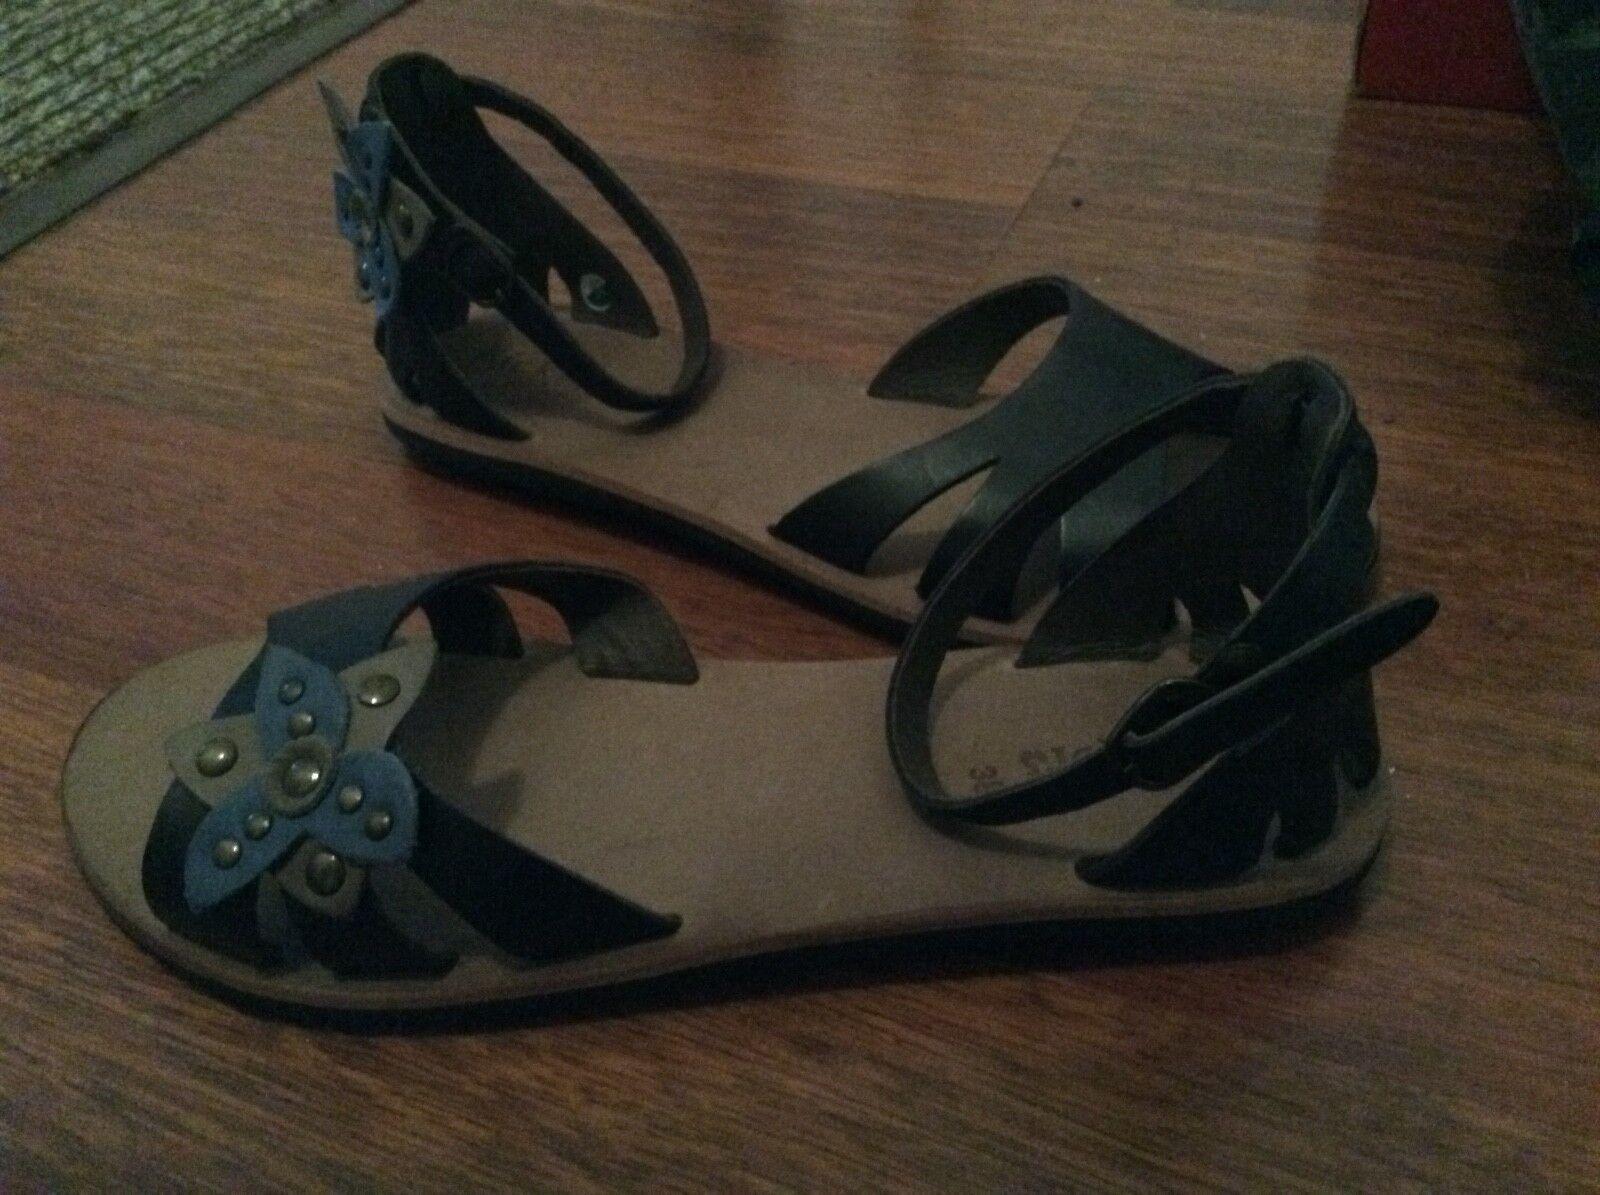 femmes kickers () bleu spartwin cheville sandales en cuir taille 5 () kickers f28206